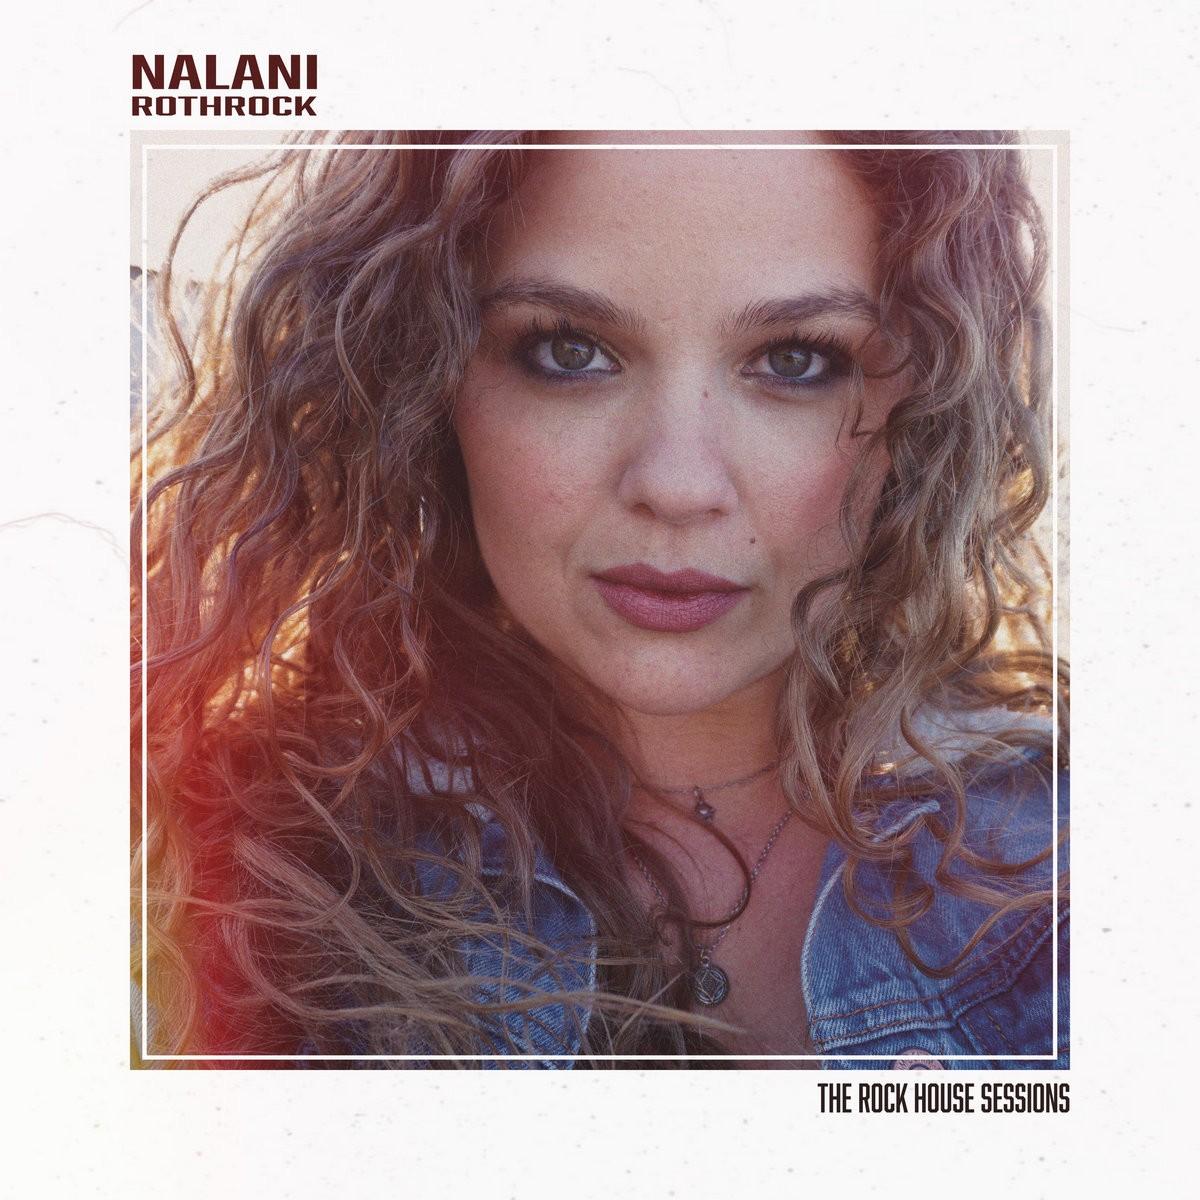 Nalani Rothrock - The Rock House Sessions